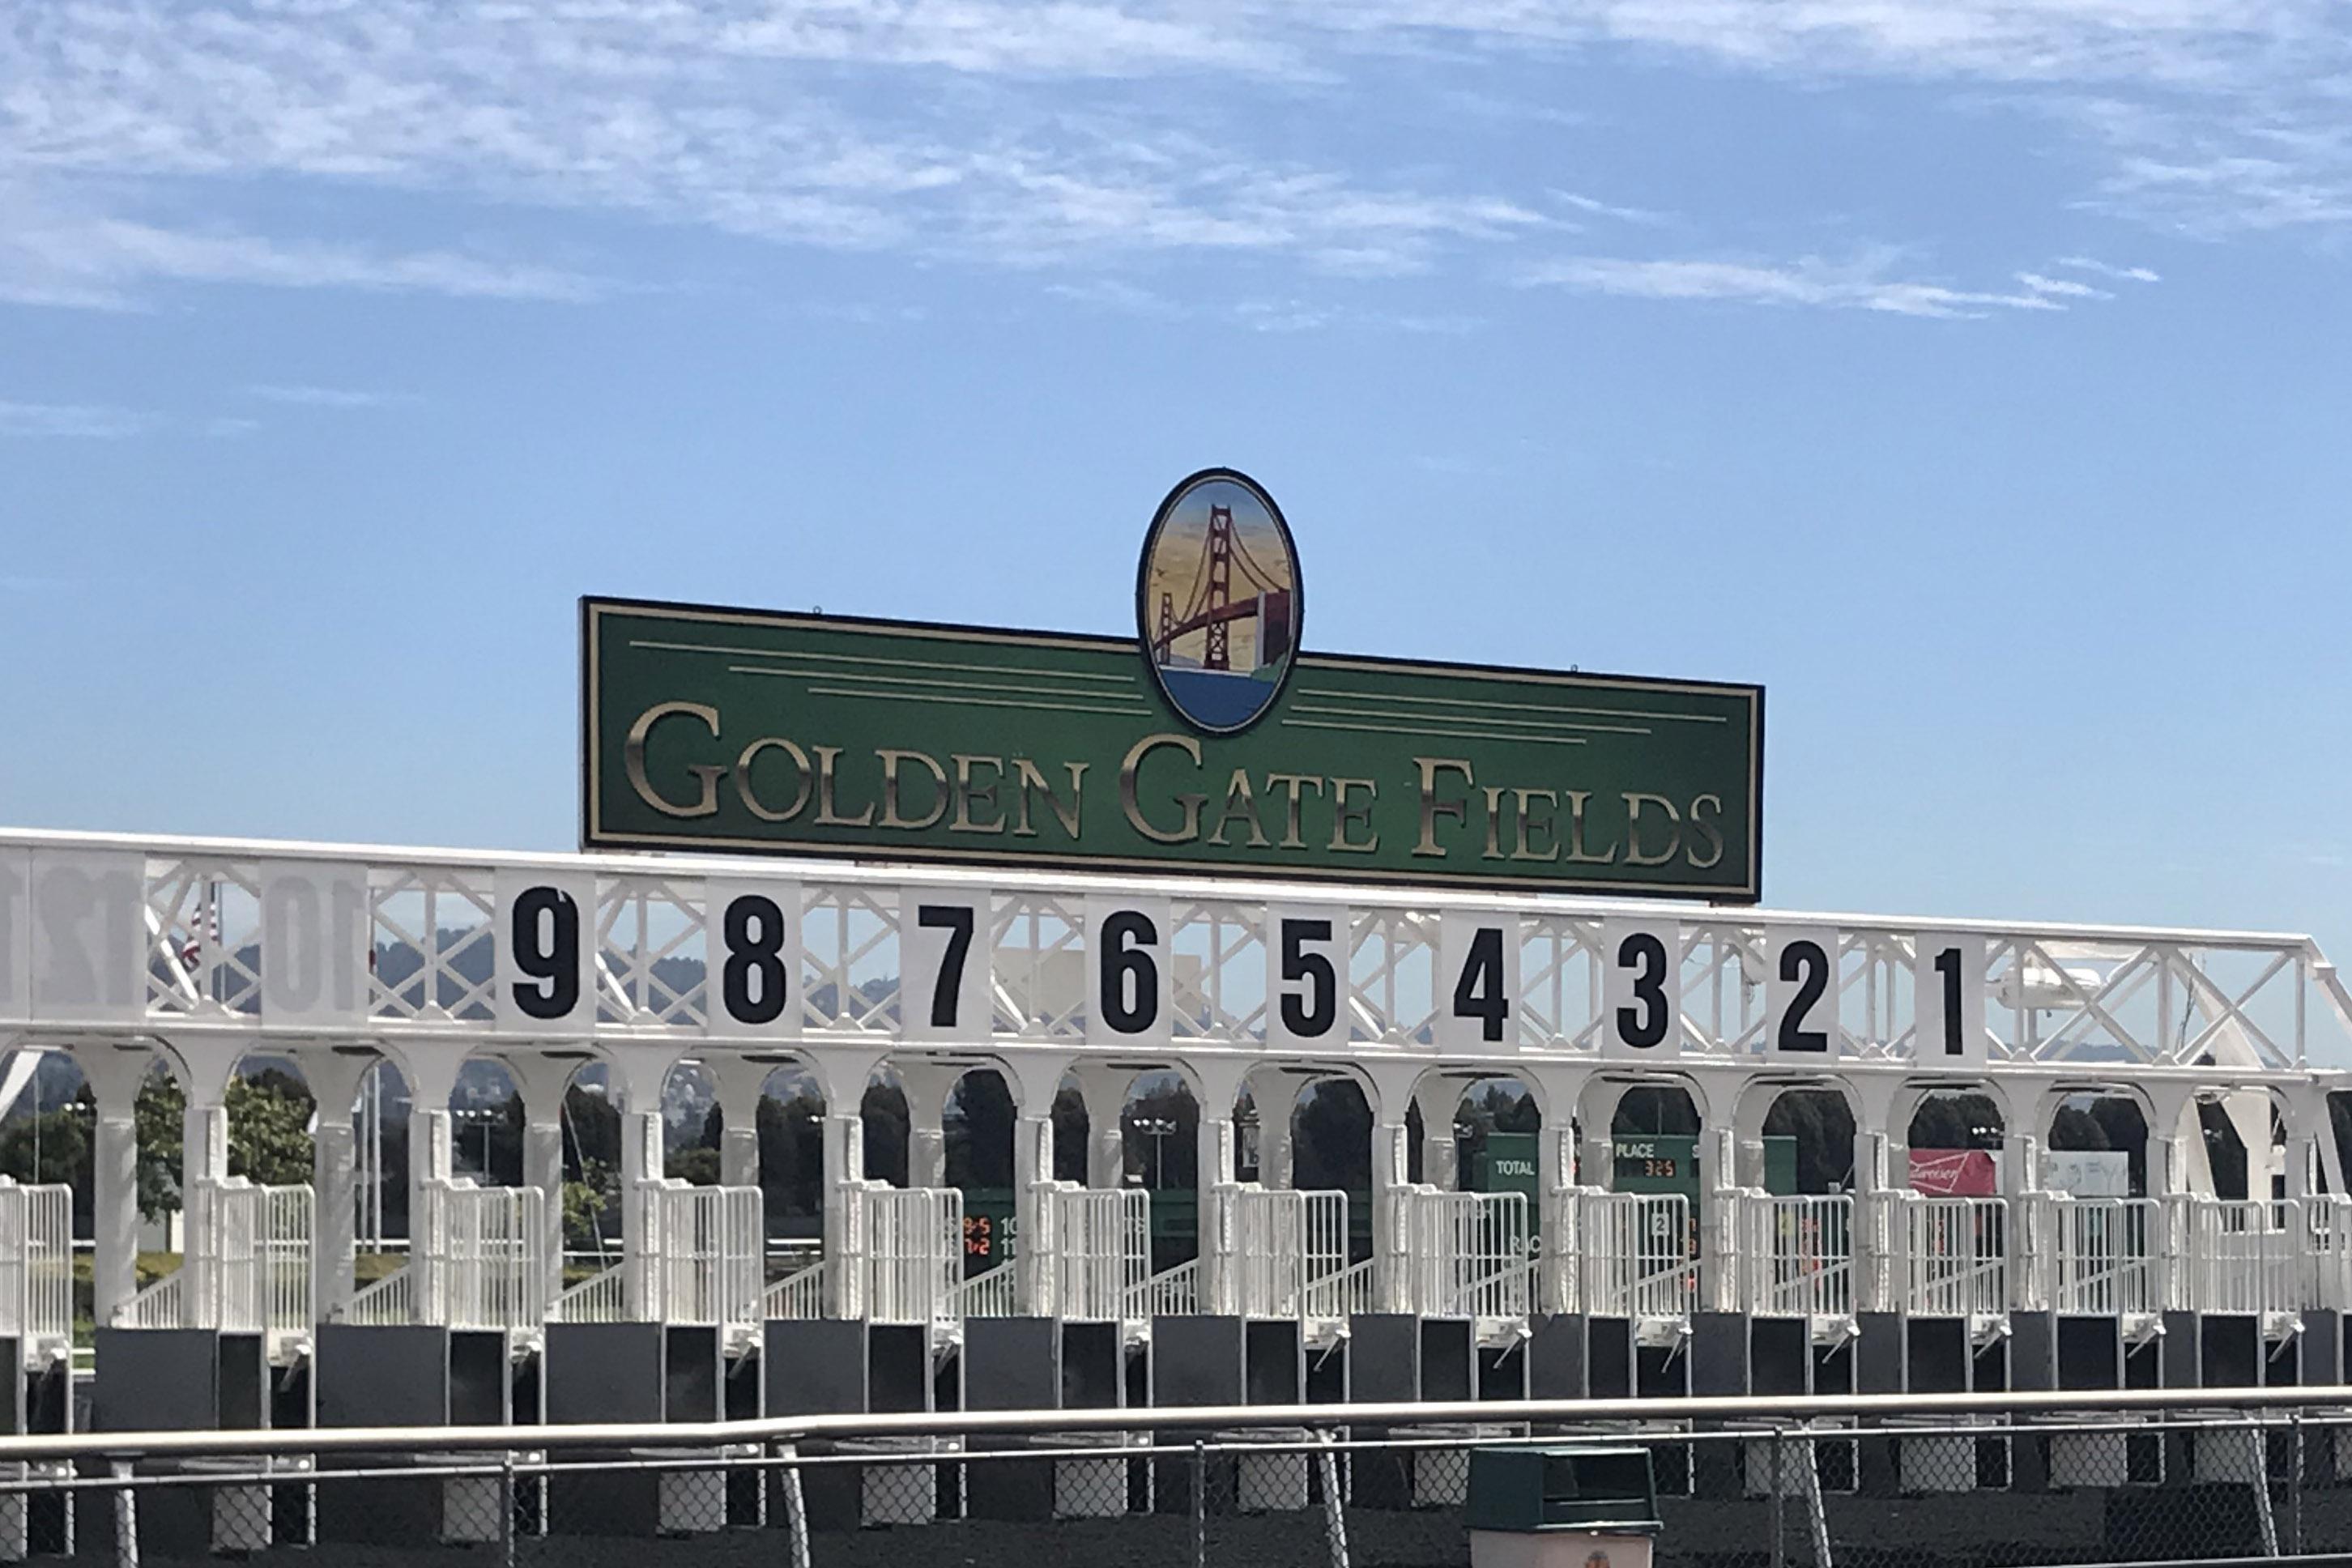 Golden Gate Fields starting gate